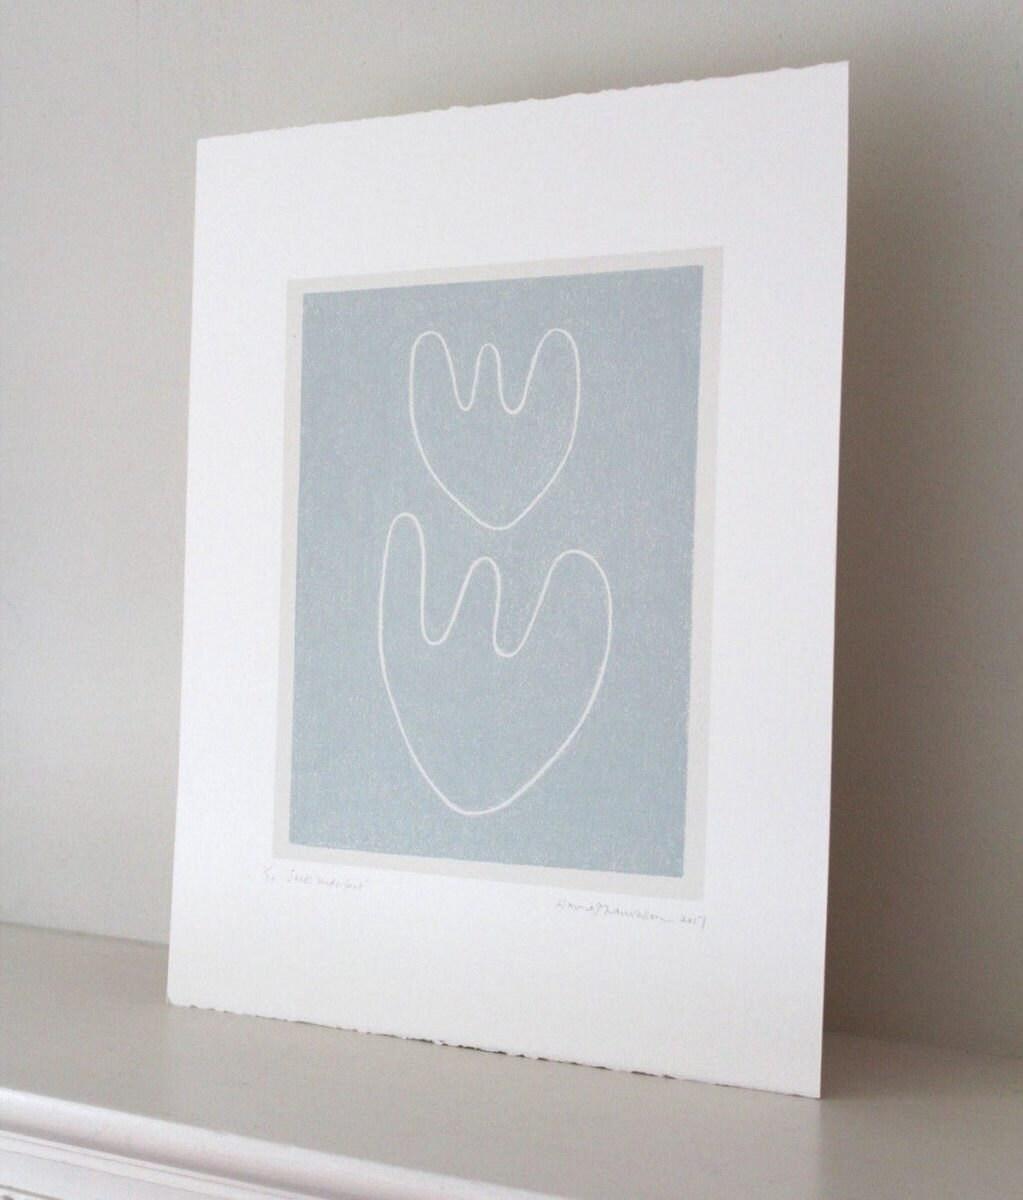 Original silkscreen print from Emma Lawrenson